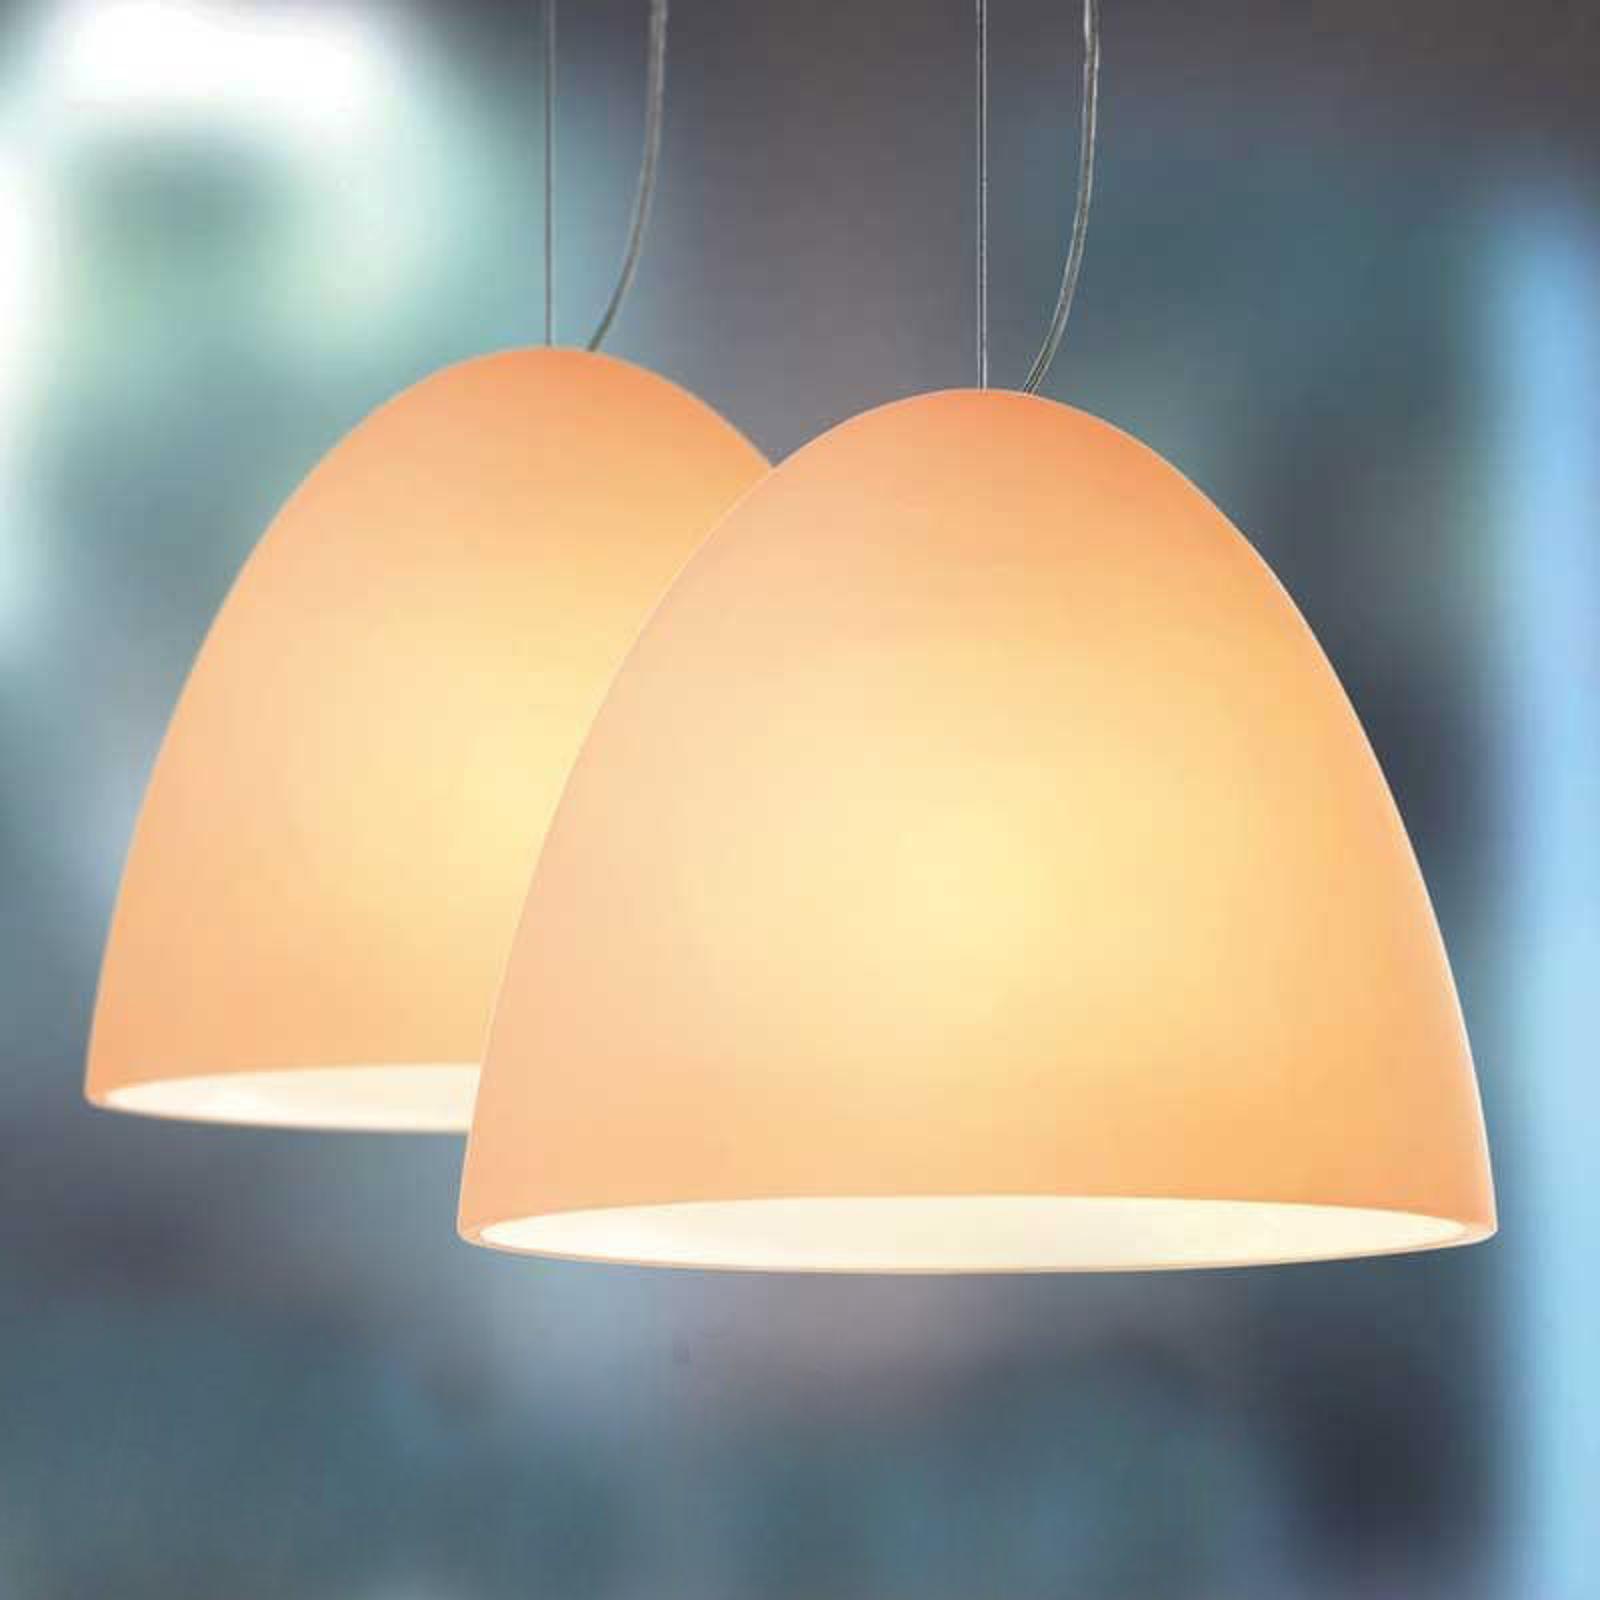 Lámpara colgante BELL color arena 21 cm 2 brazos